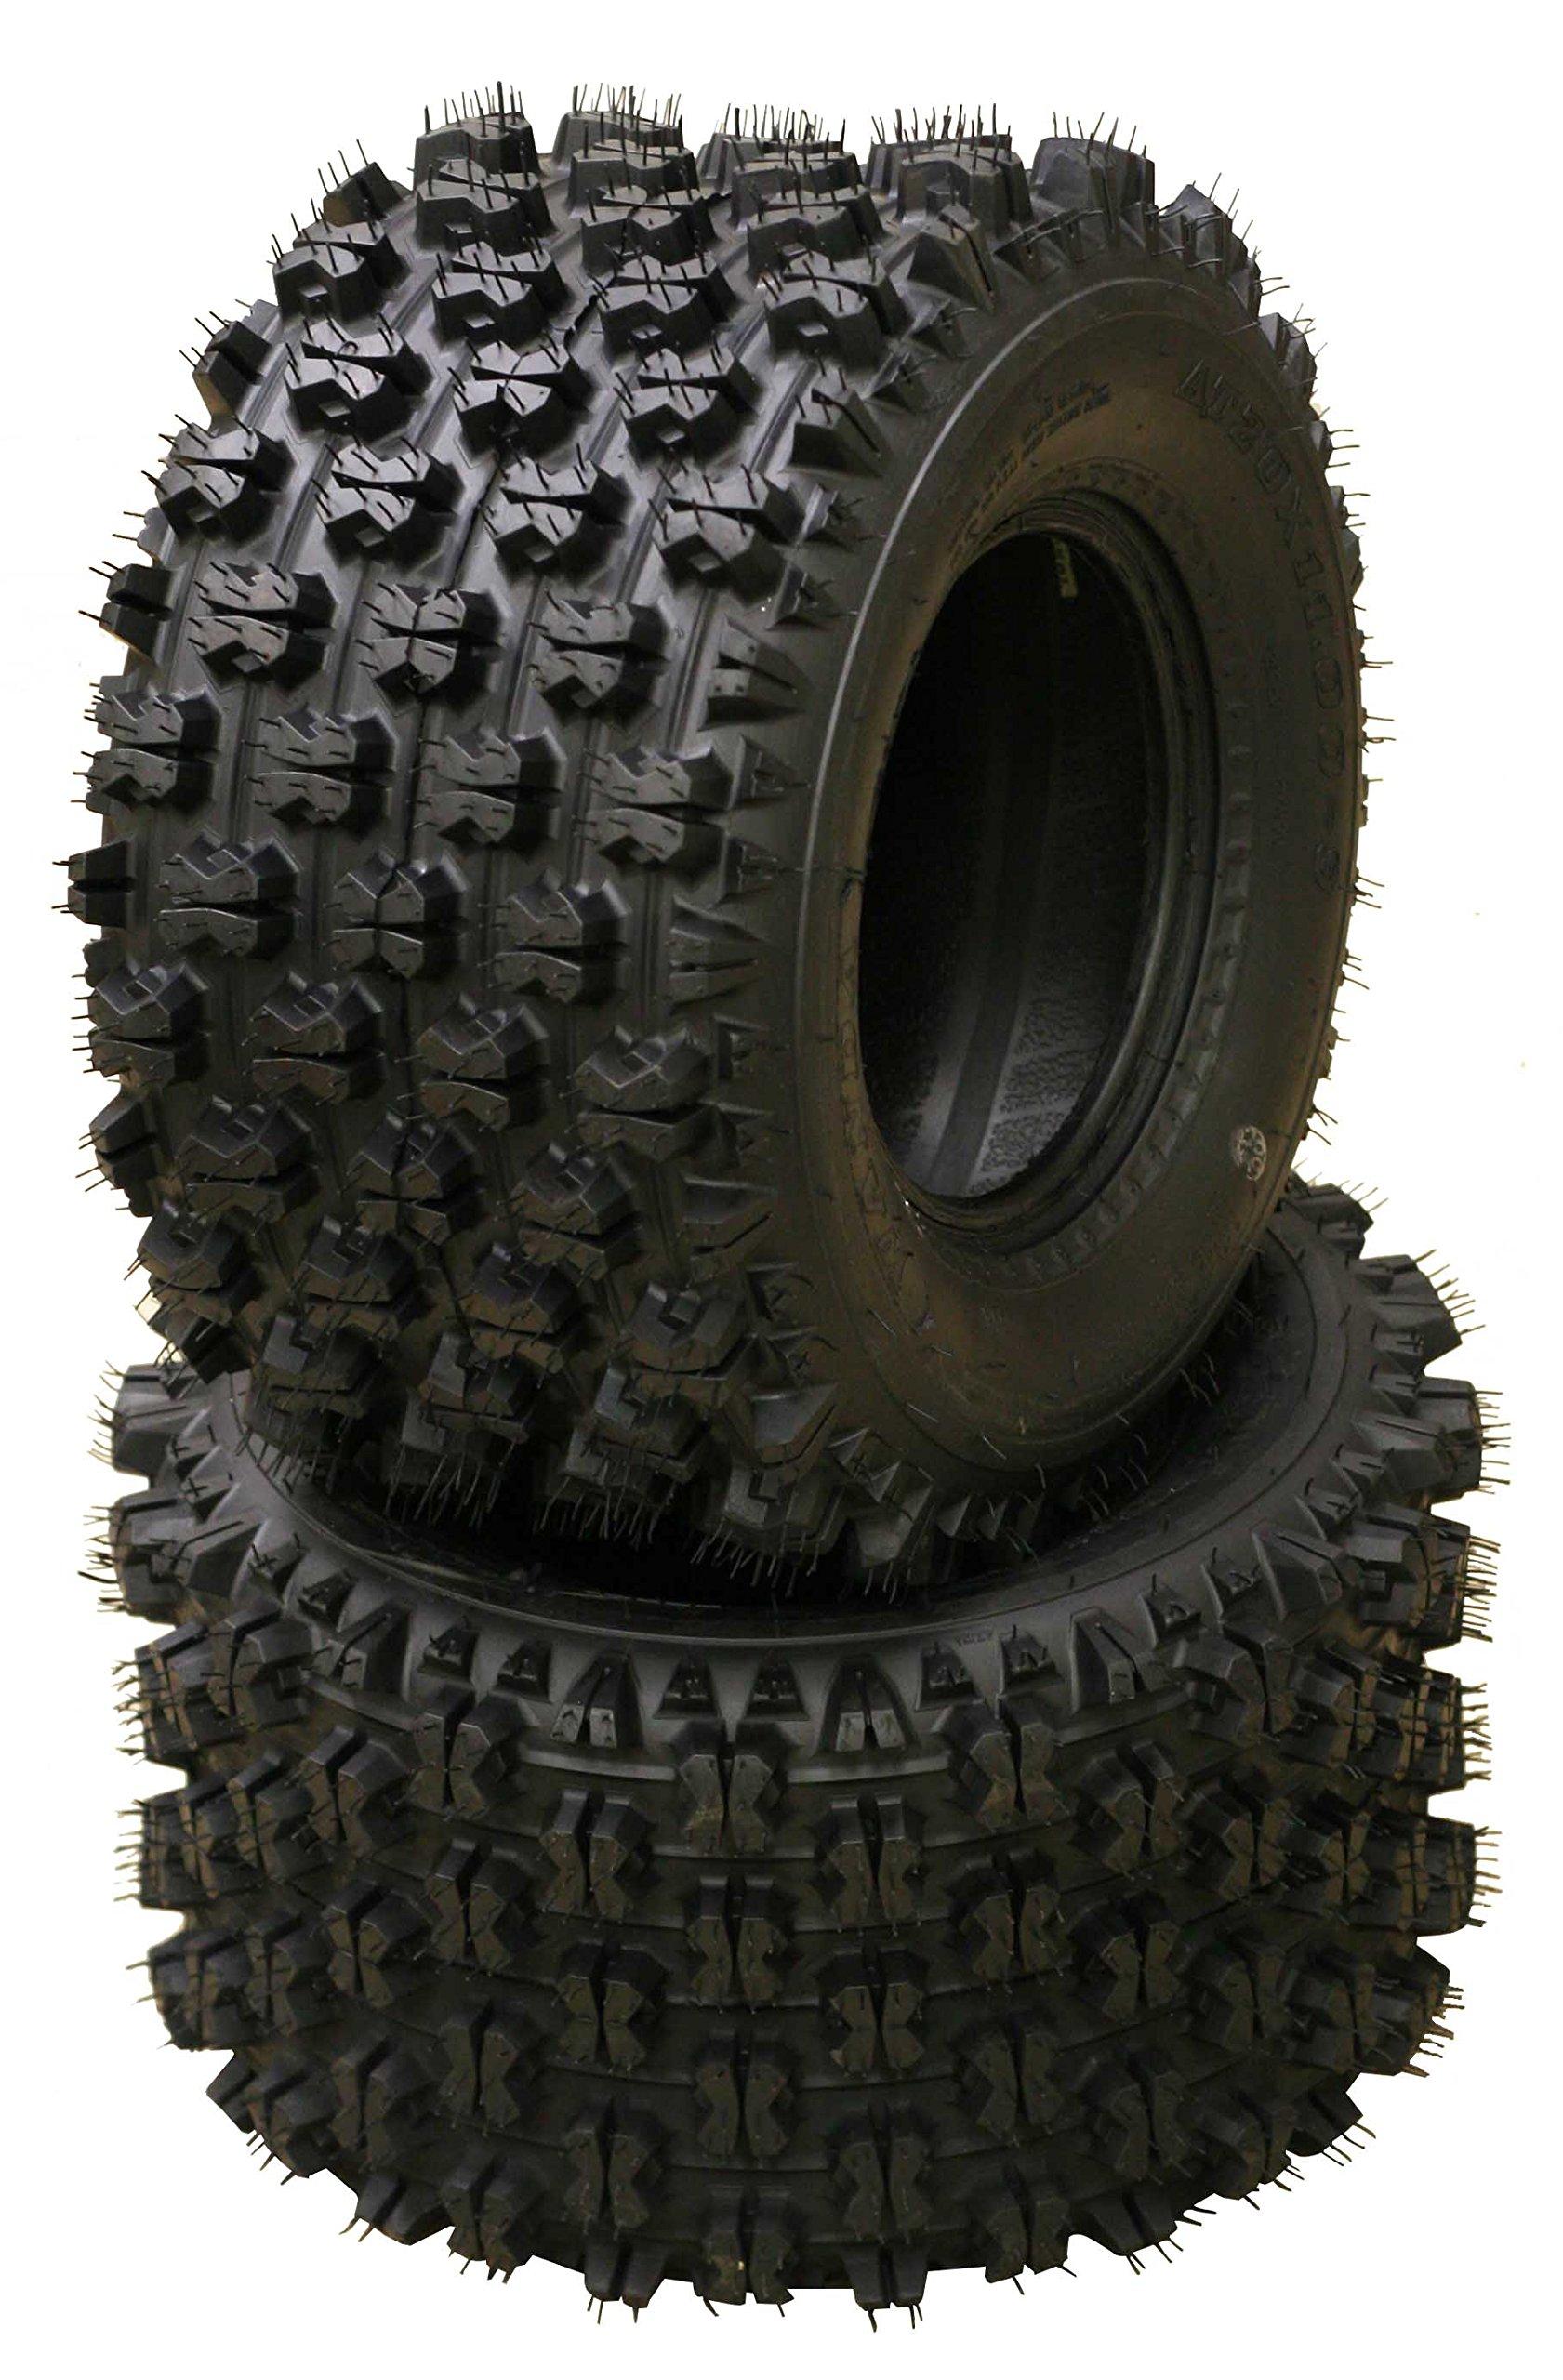 Set of 4 New Sport ATV Tires 22x7-10 Front & 22x10-10 Rear /4PR - 10077/10089 by Wanda (Image #3)